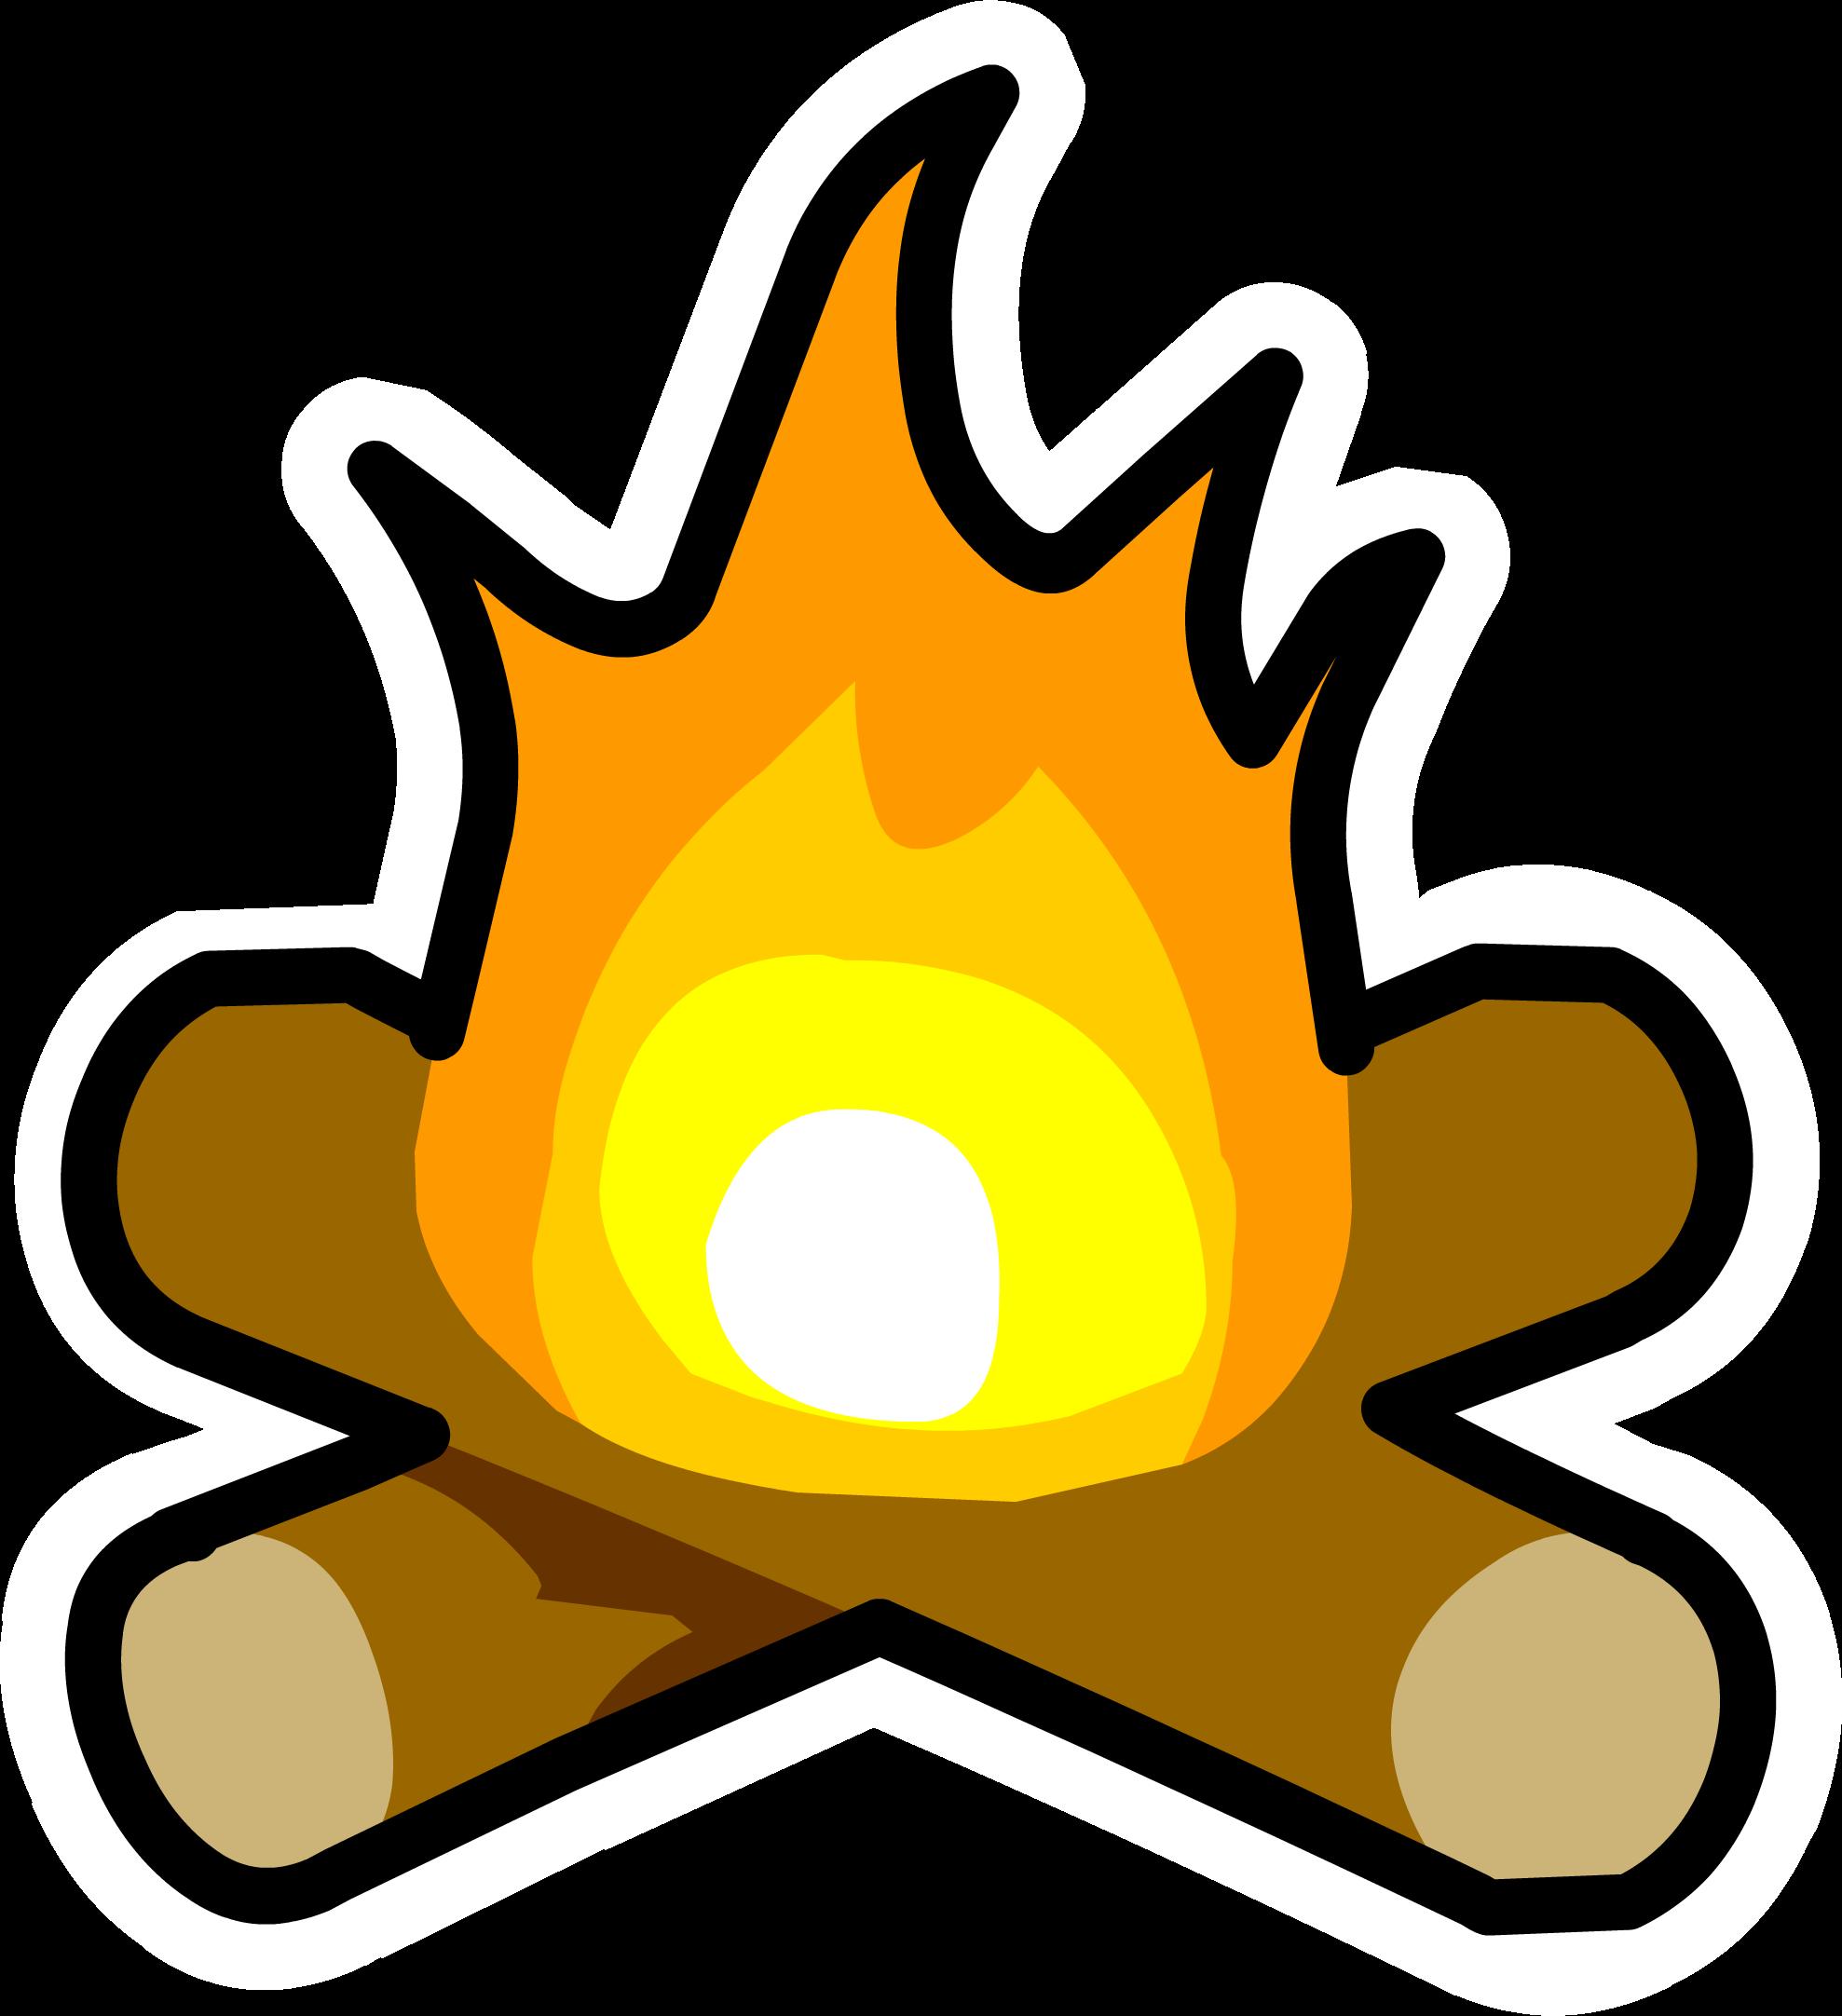 jpg download Bonfire clipart fogata. Pin club penguin wiki